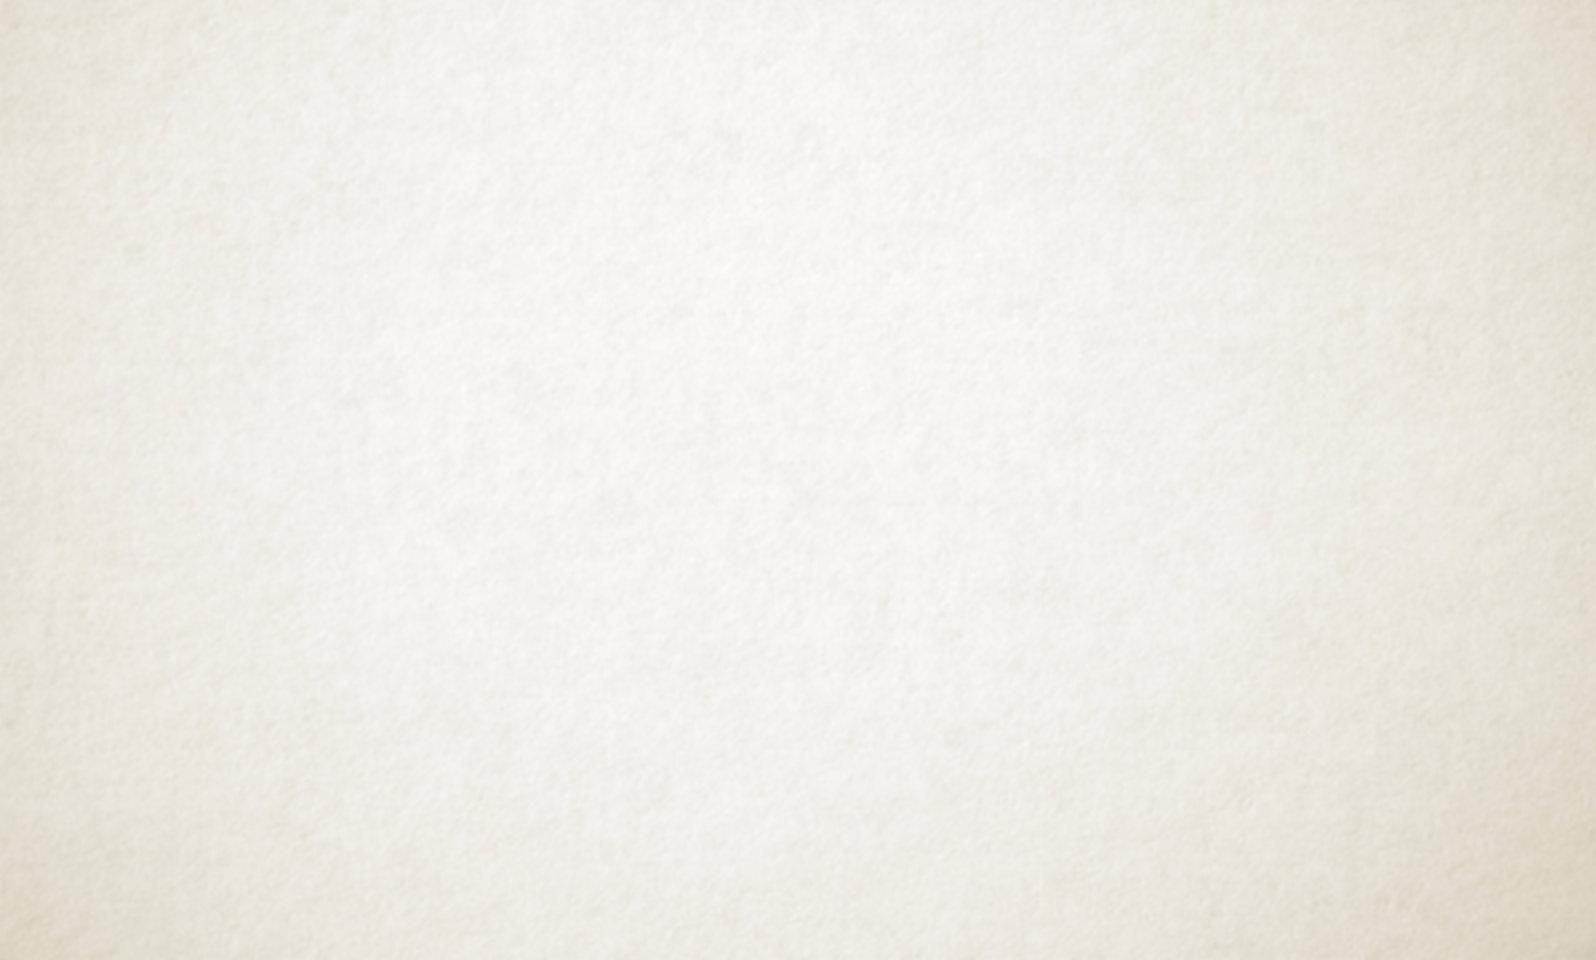 Paper Background.jpg